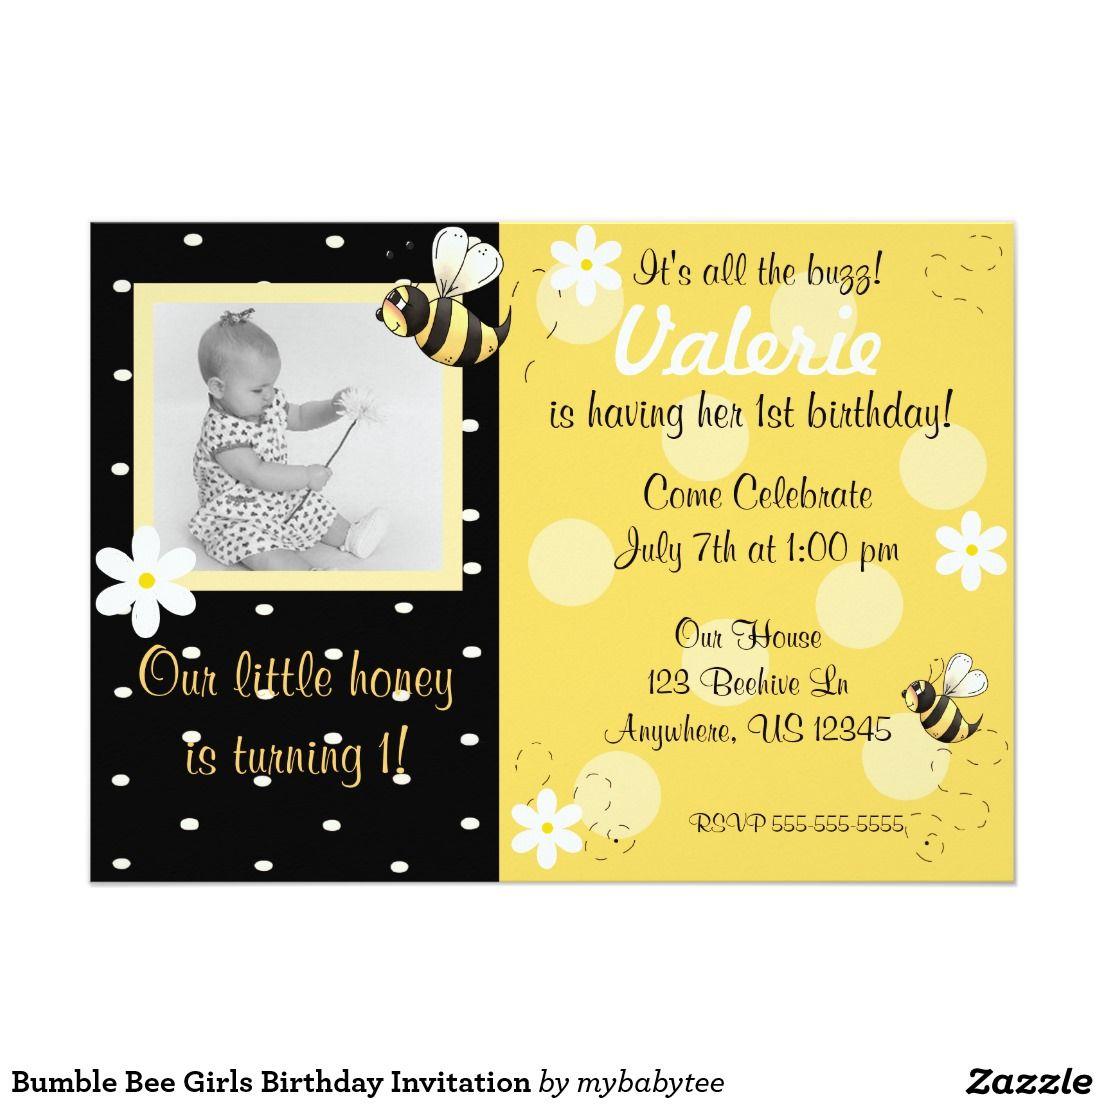 Bumble bee girls birthday invitation cute invitations shop bumble bee girls birthday invitation created by mybabytee filmwisefo Images